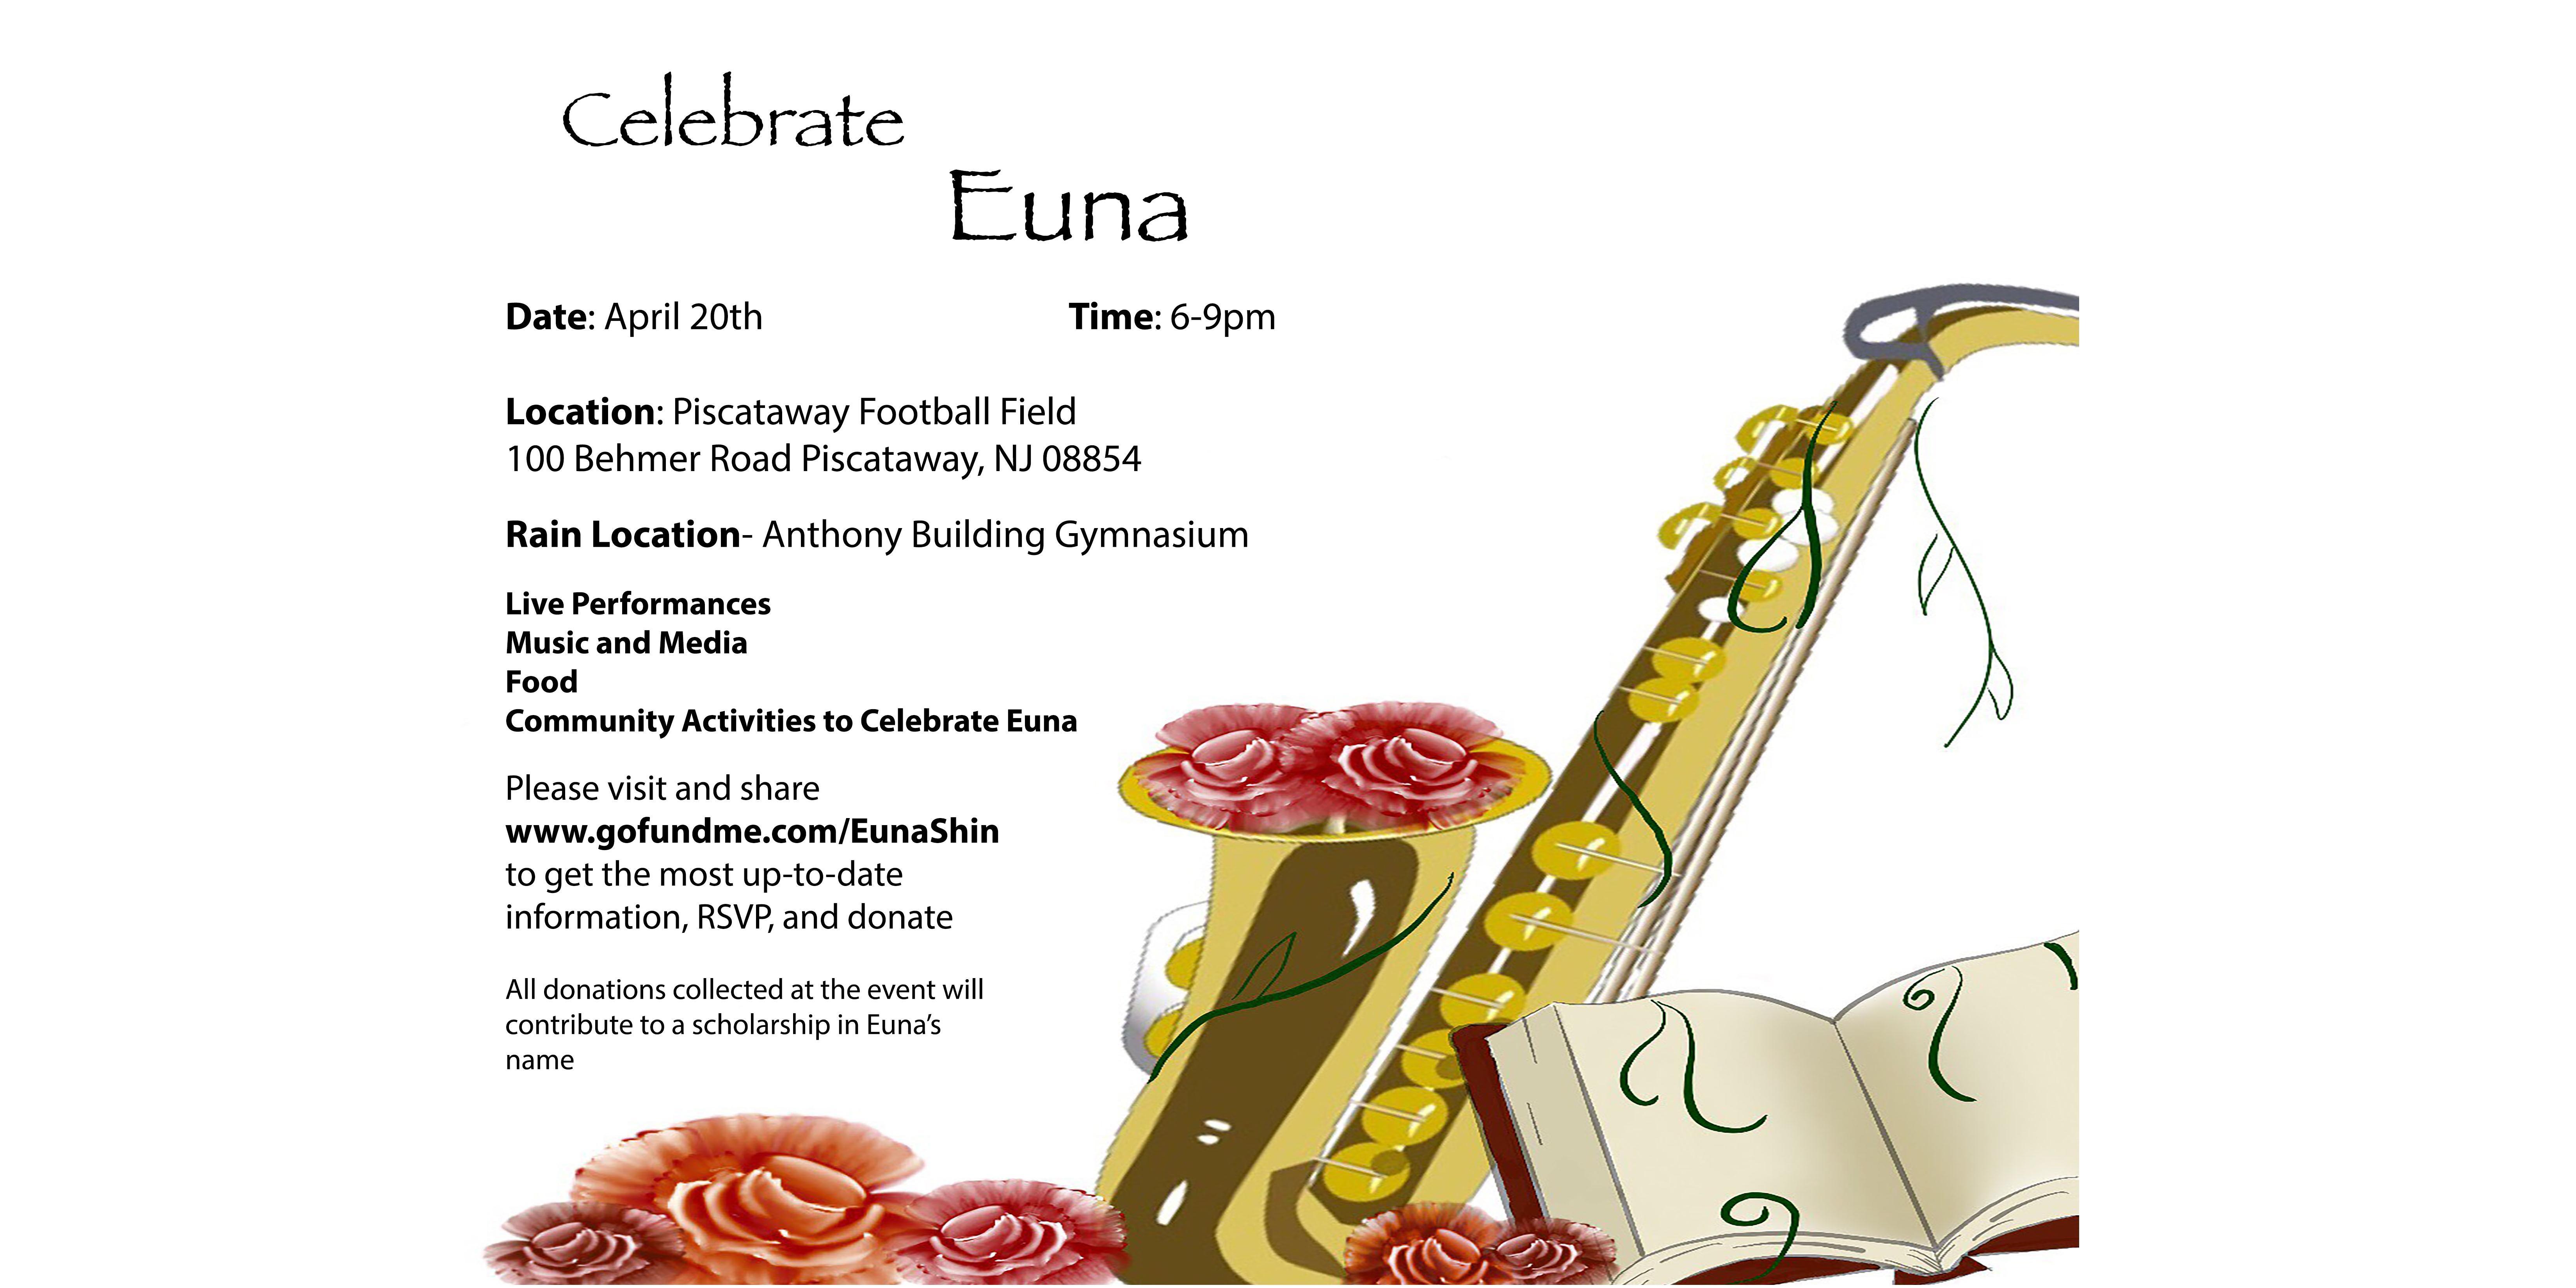 Celebration of Euna